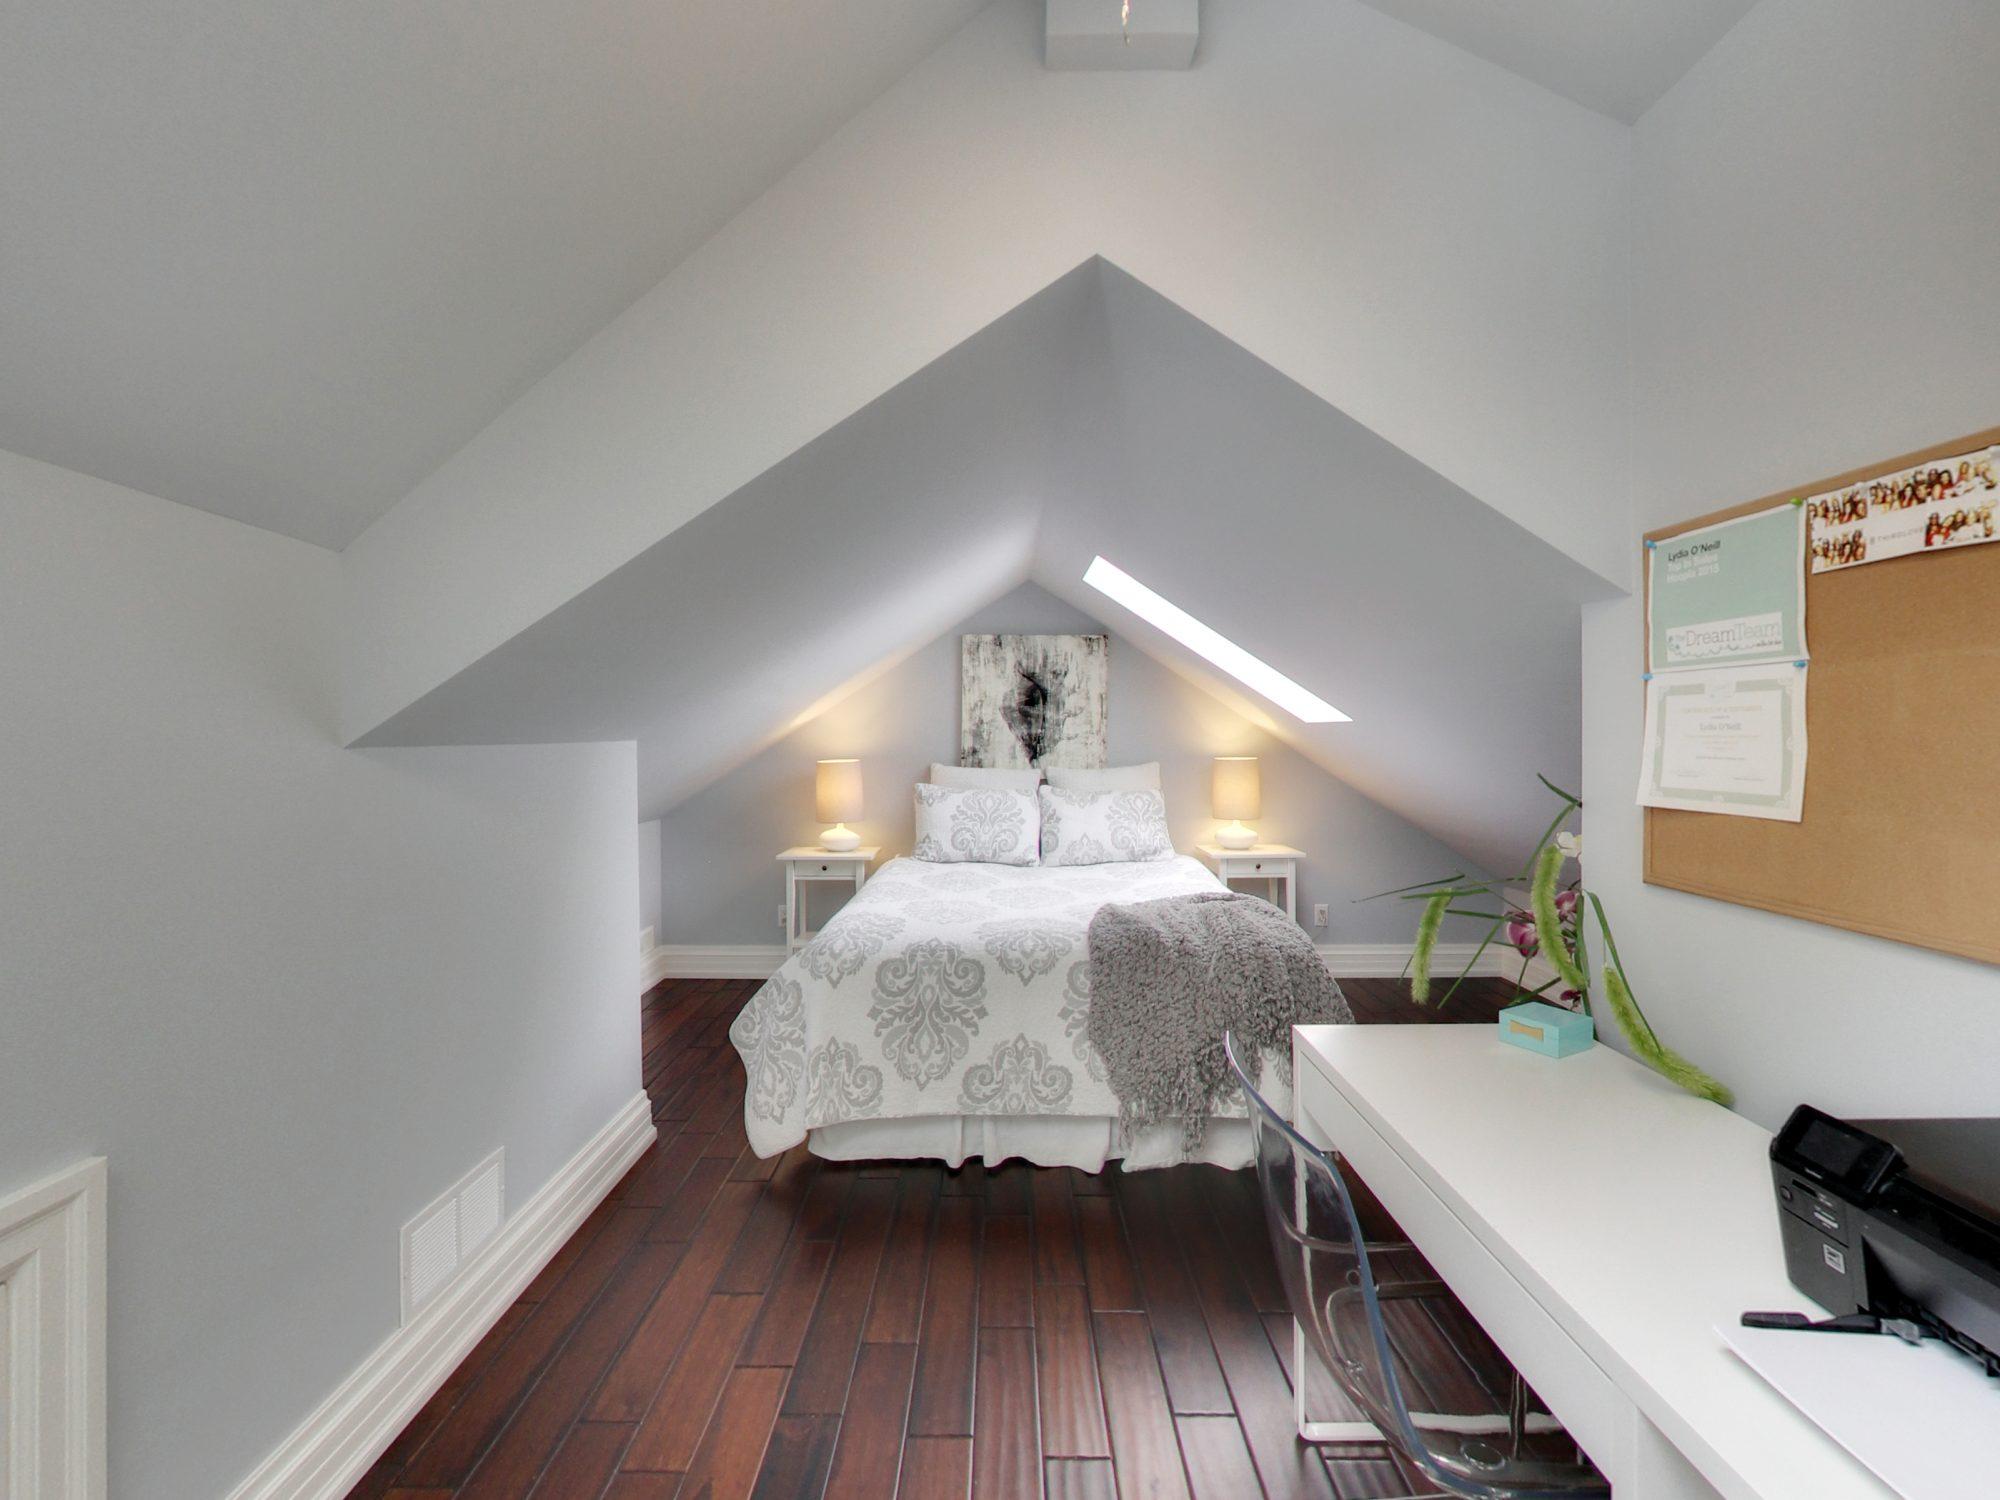 toronto-house-for-sale-15-shand-avenue-12